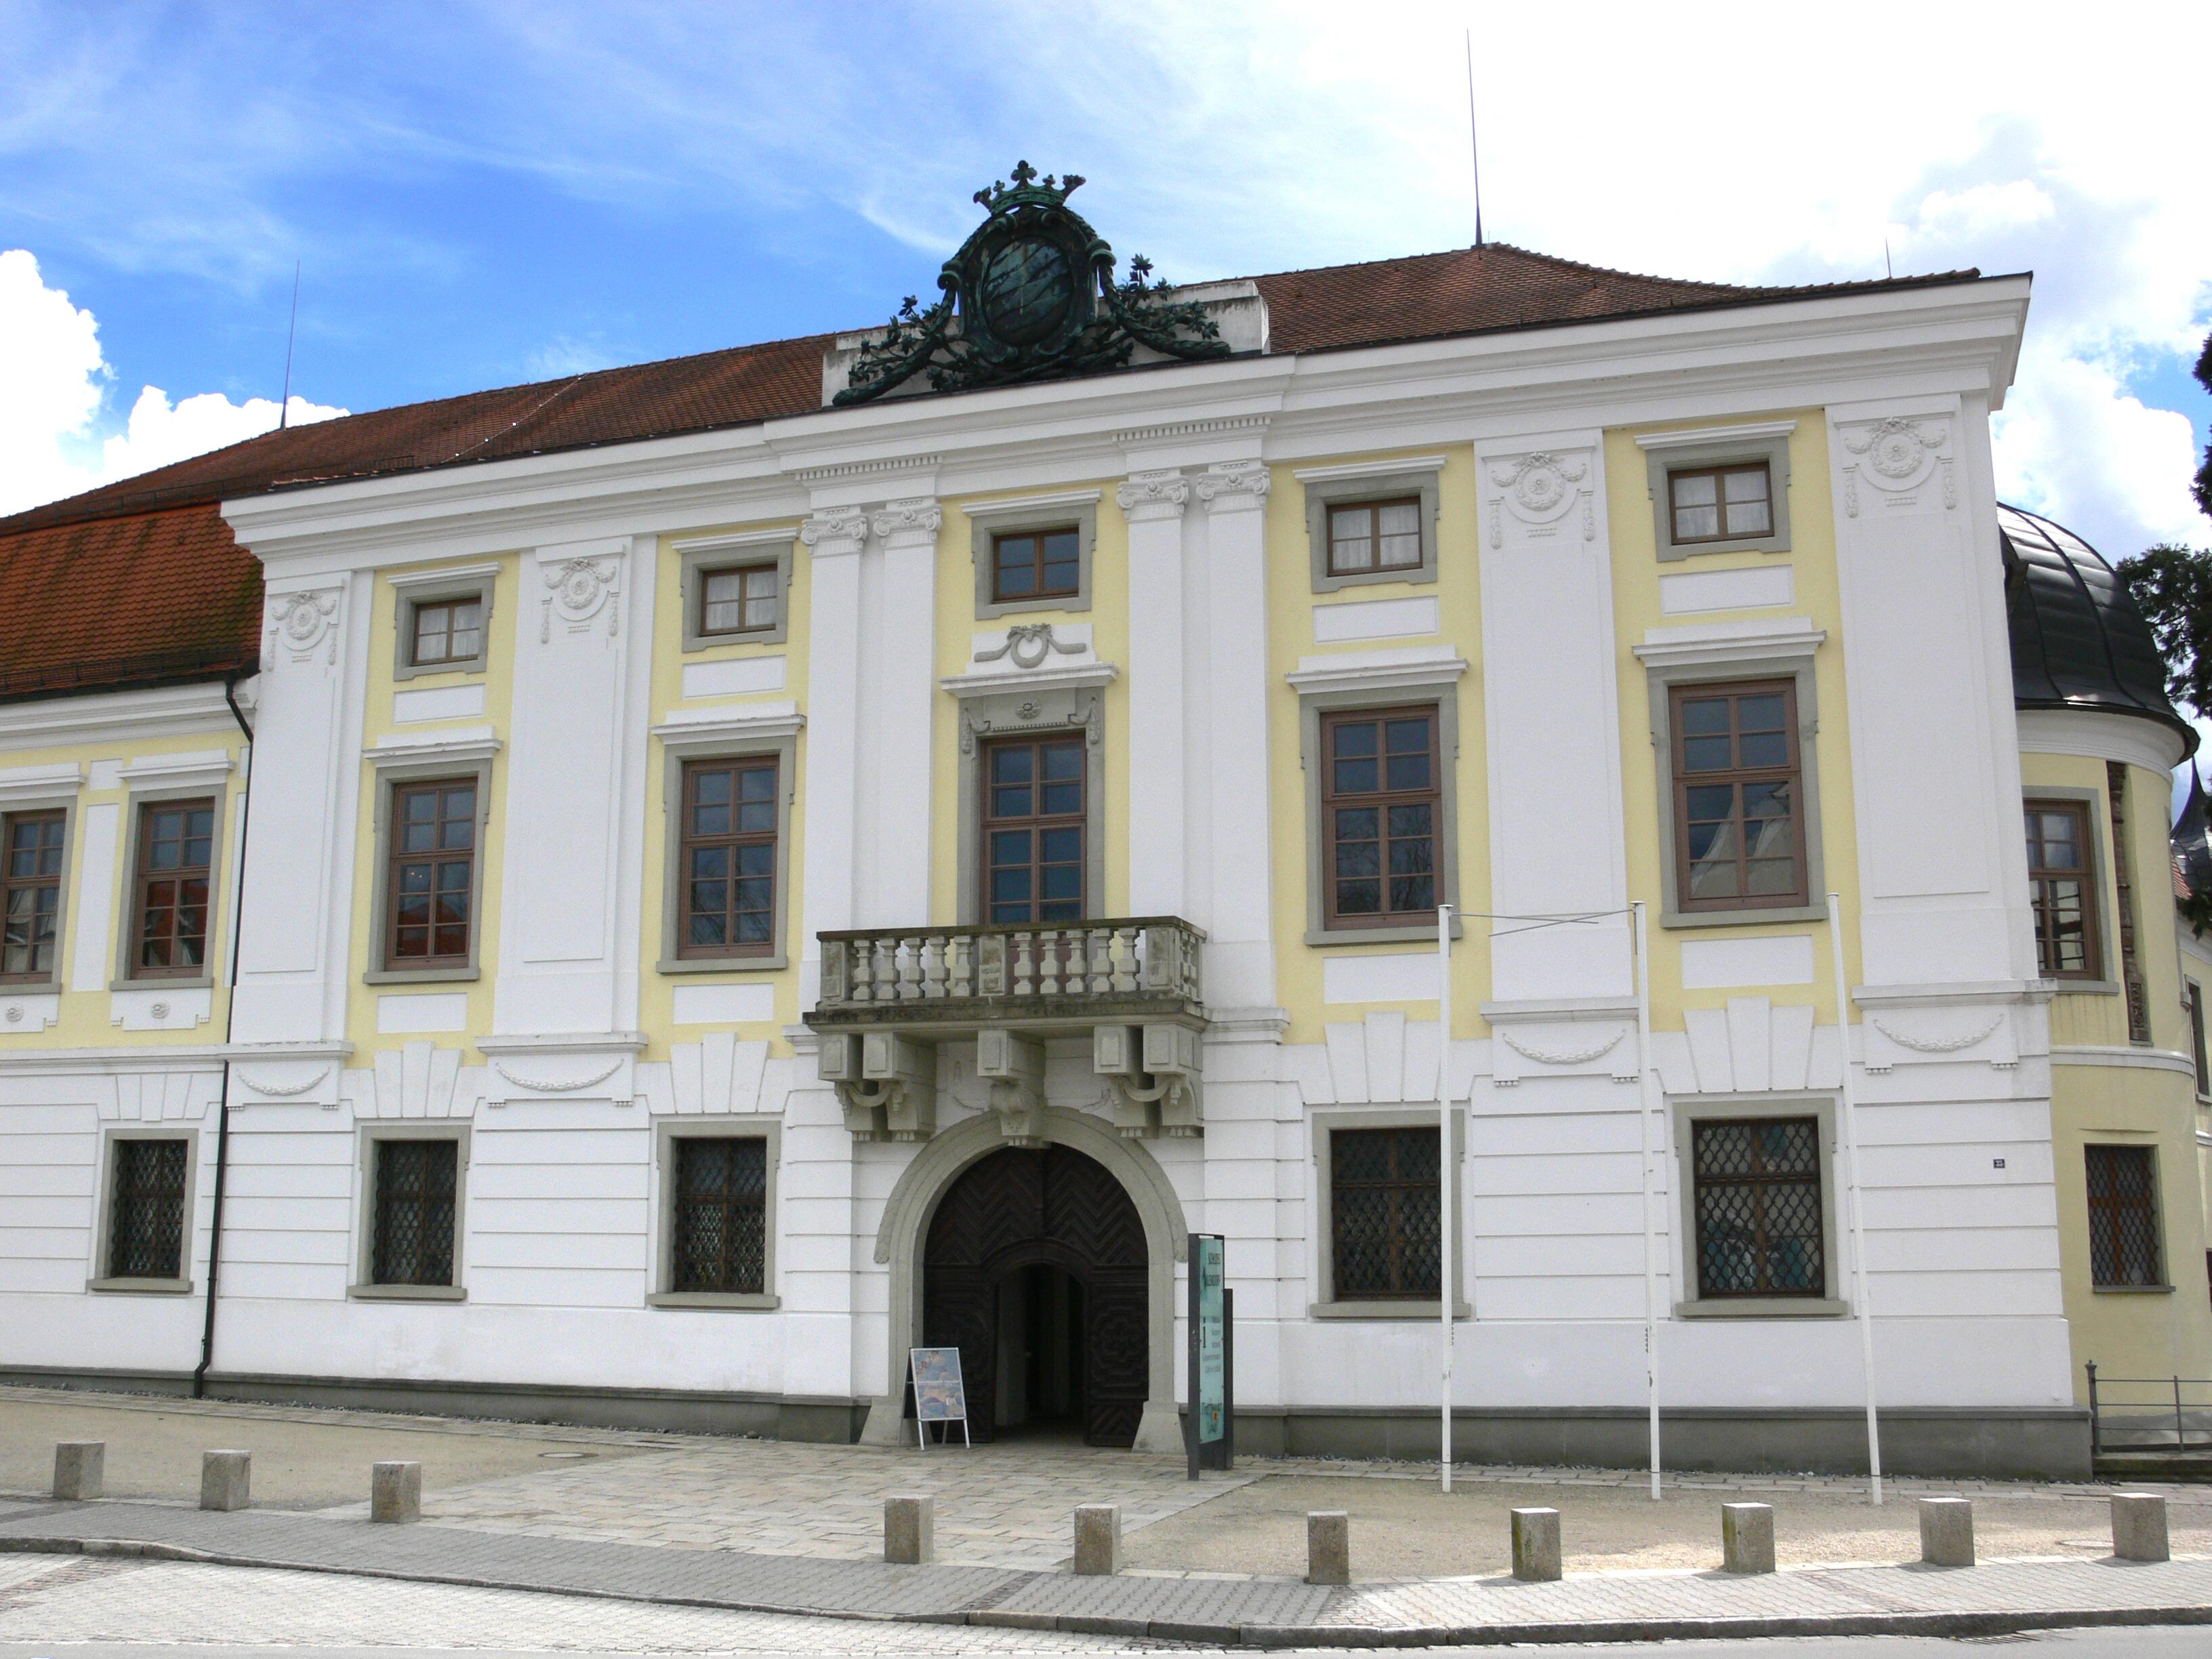 ''Fassade'' von Schloss Aulendorf